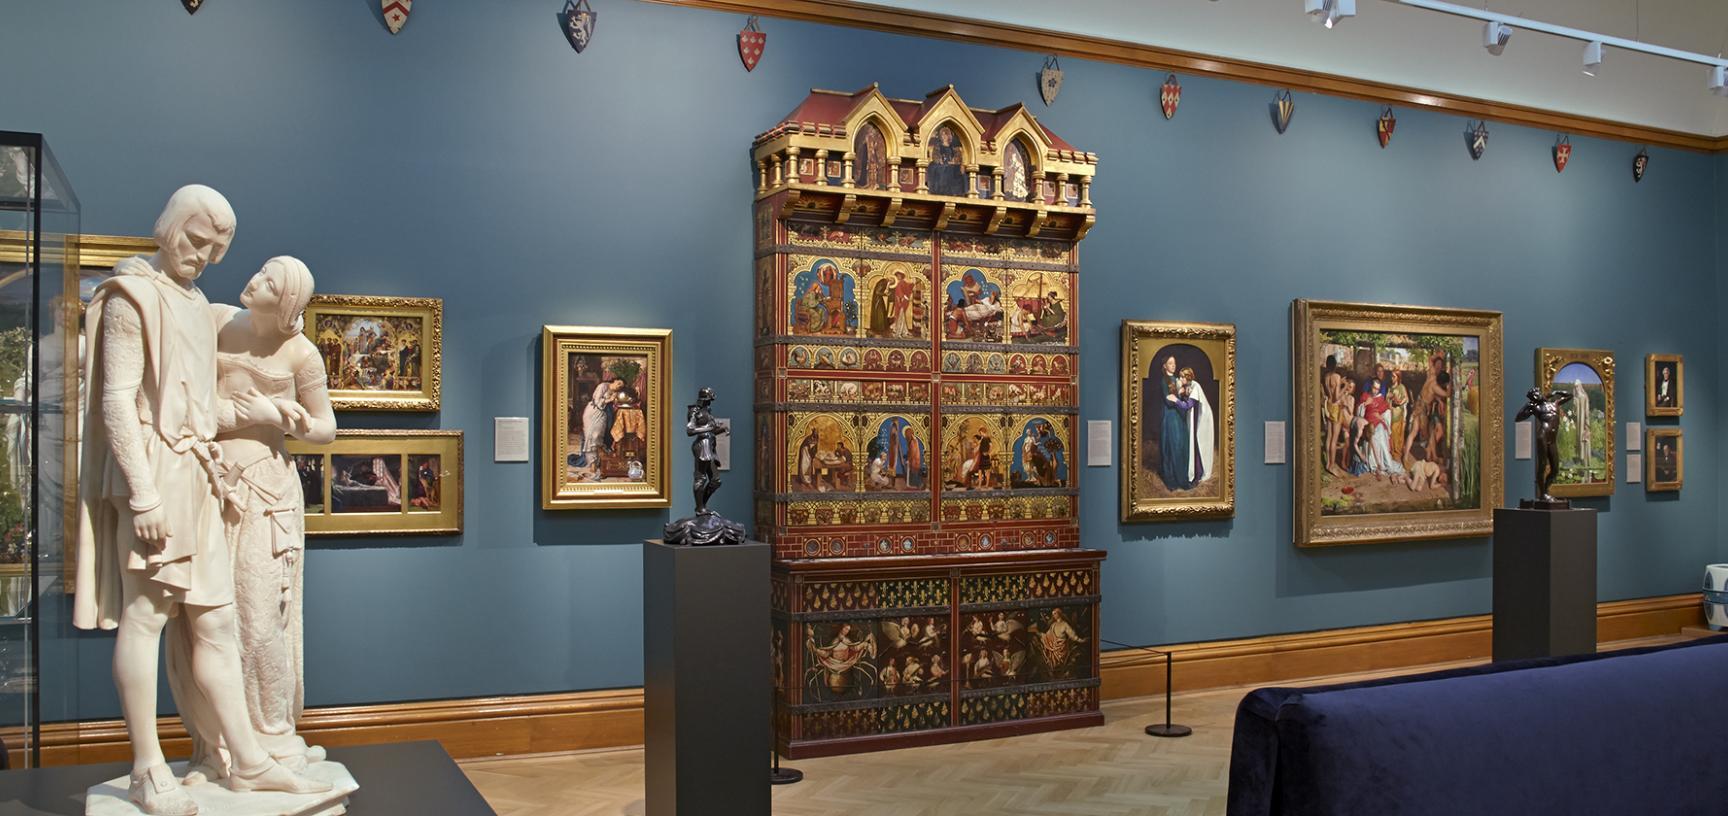 Pre-Raphaelites Gallery at the Ashmolean Museum